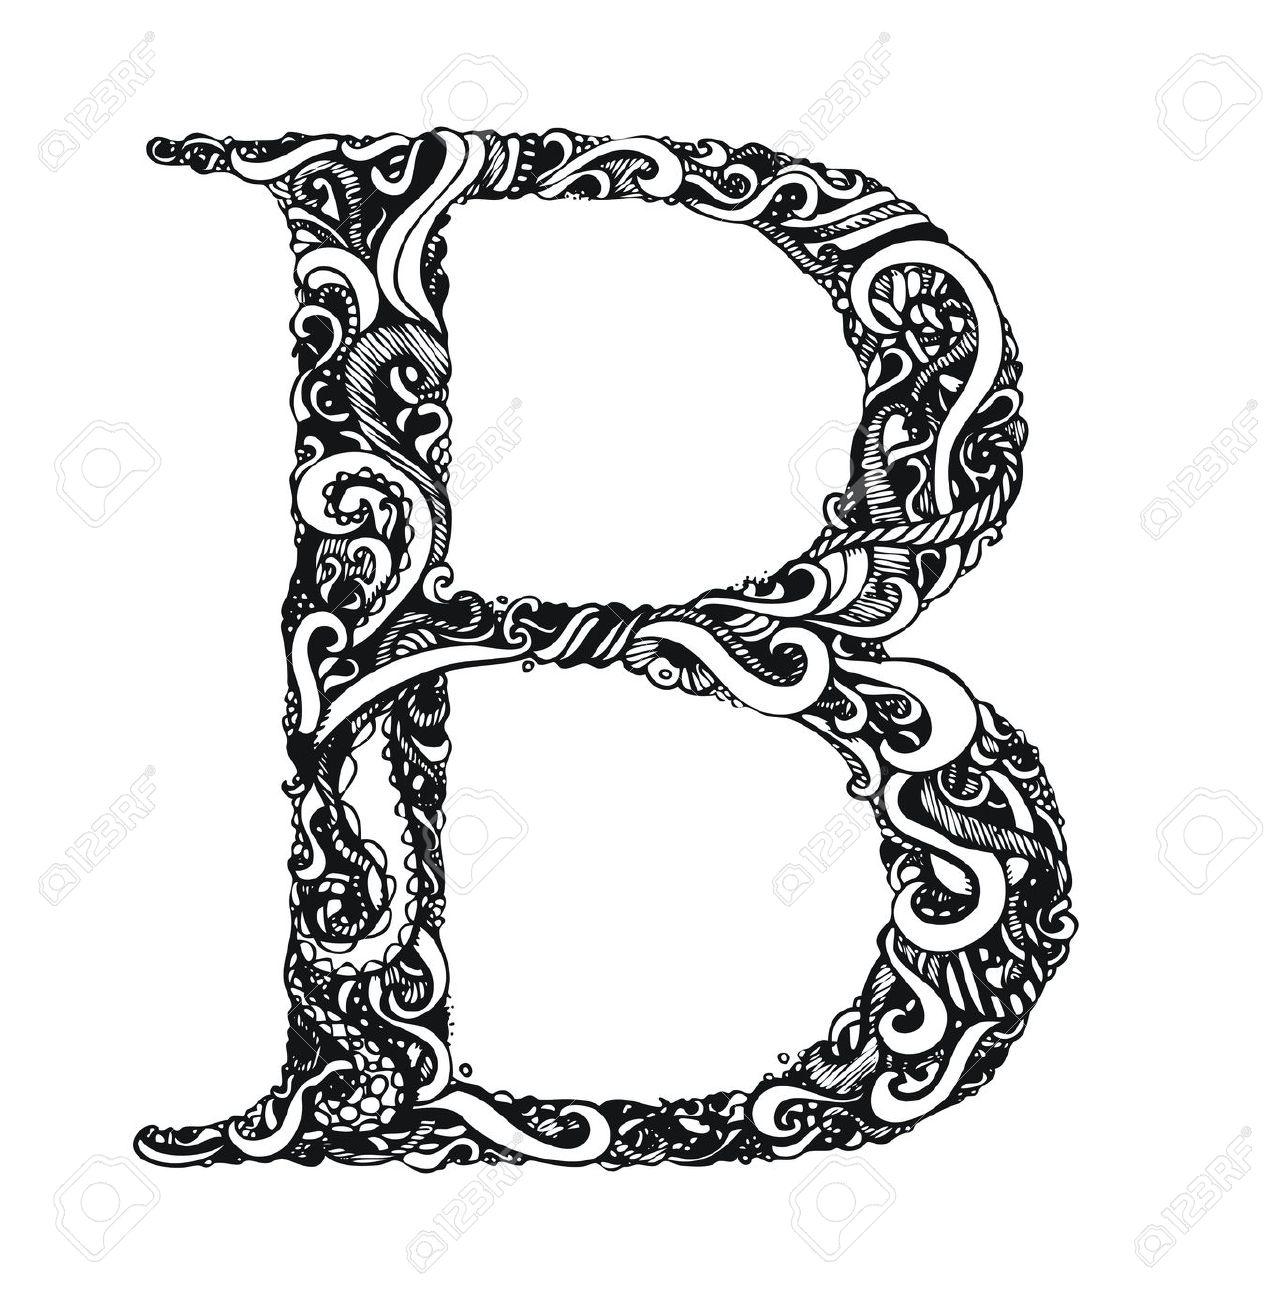 Letter b clipart free caligraphy banner black and white Letter b clipart free calligraphy - ClipartFest banner black and white